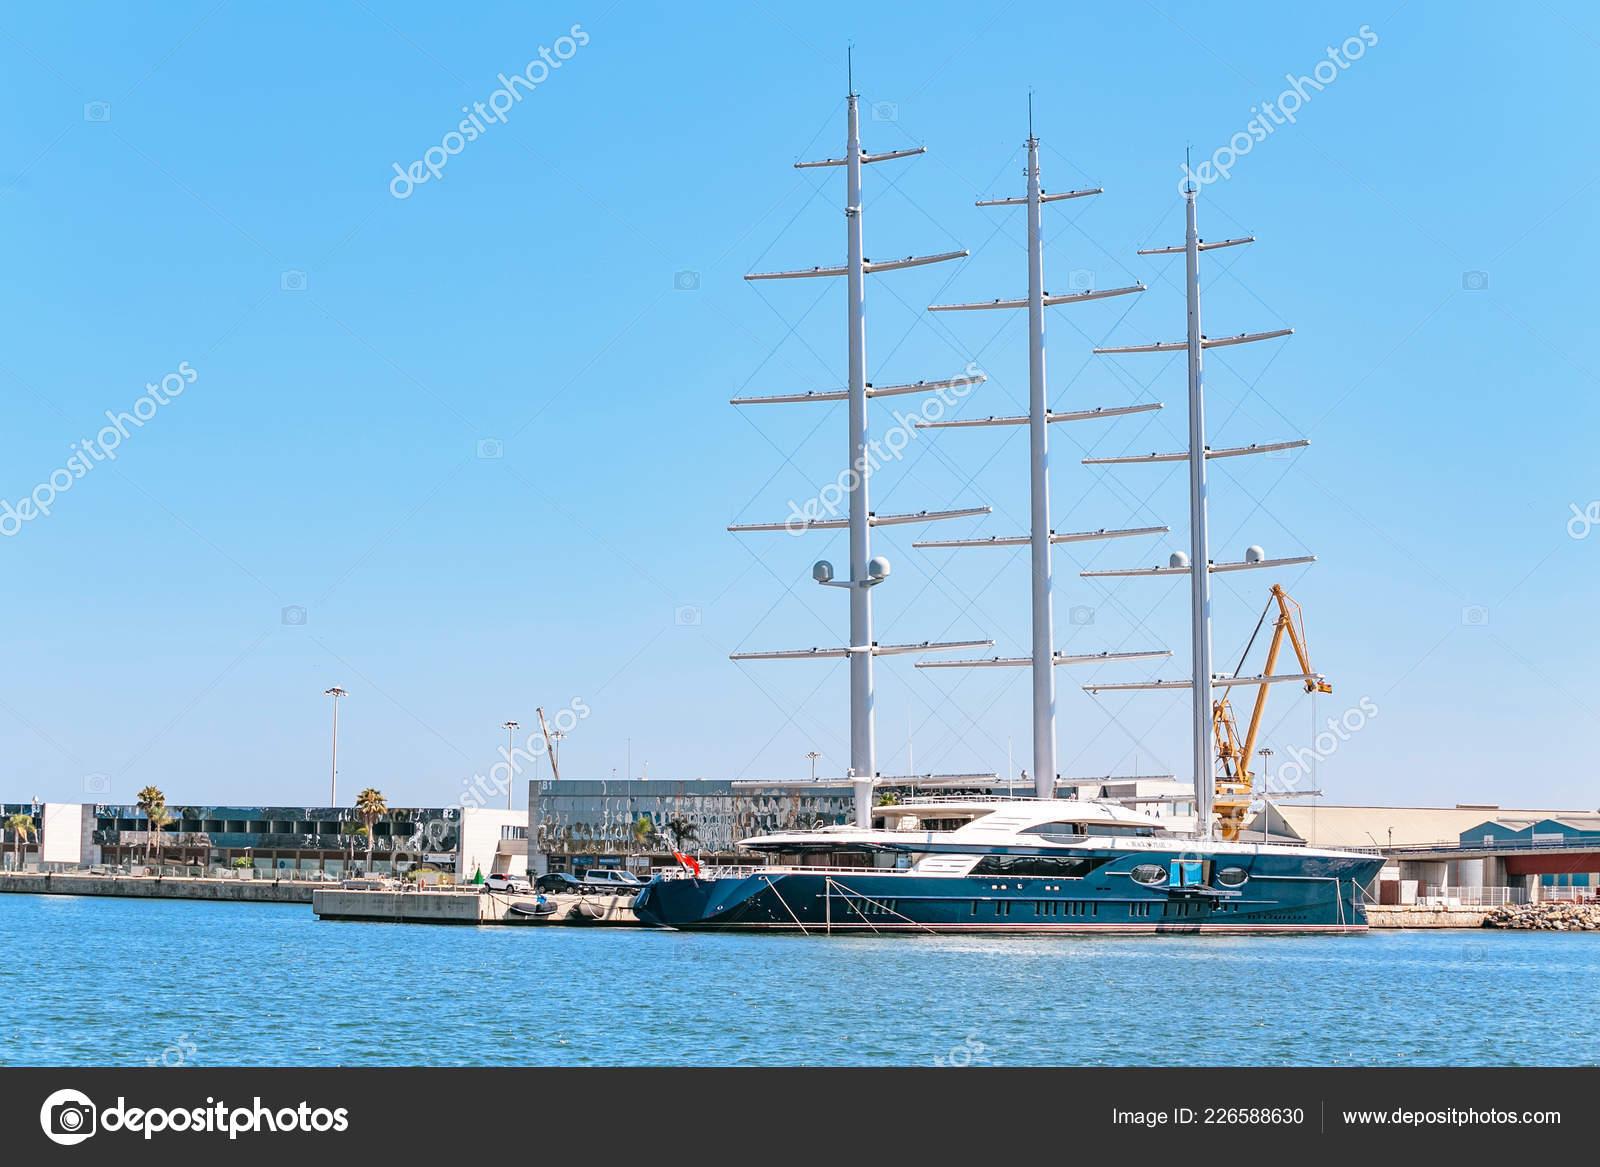 July 2018 Tarragona Spain Luxury Yacht Black Pearl Parked